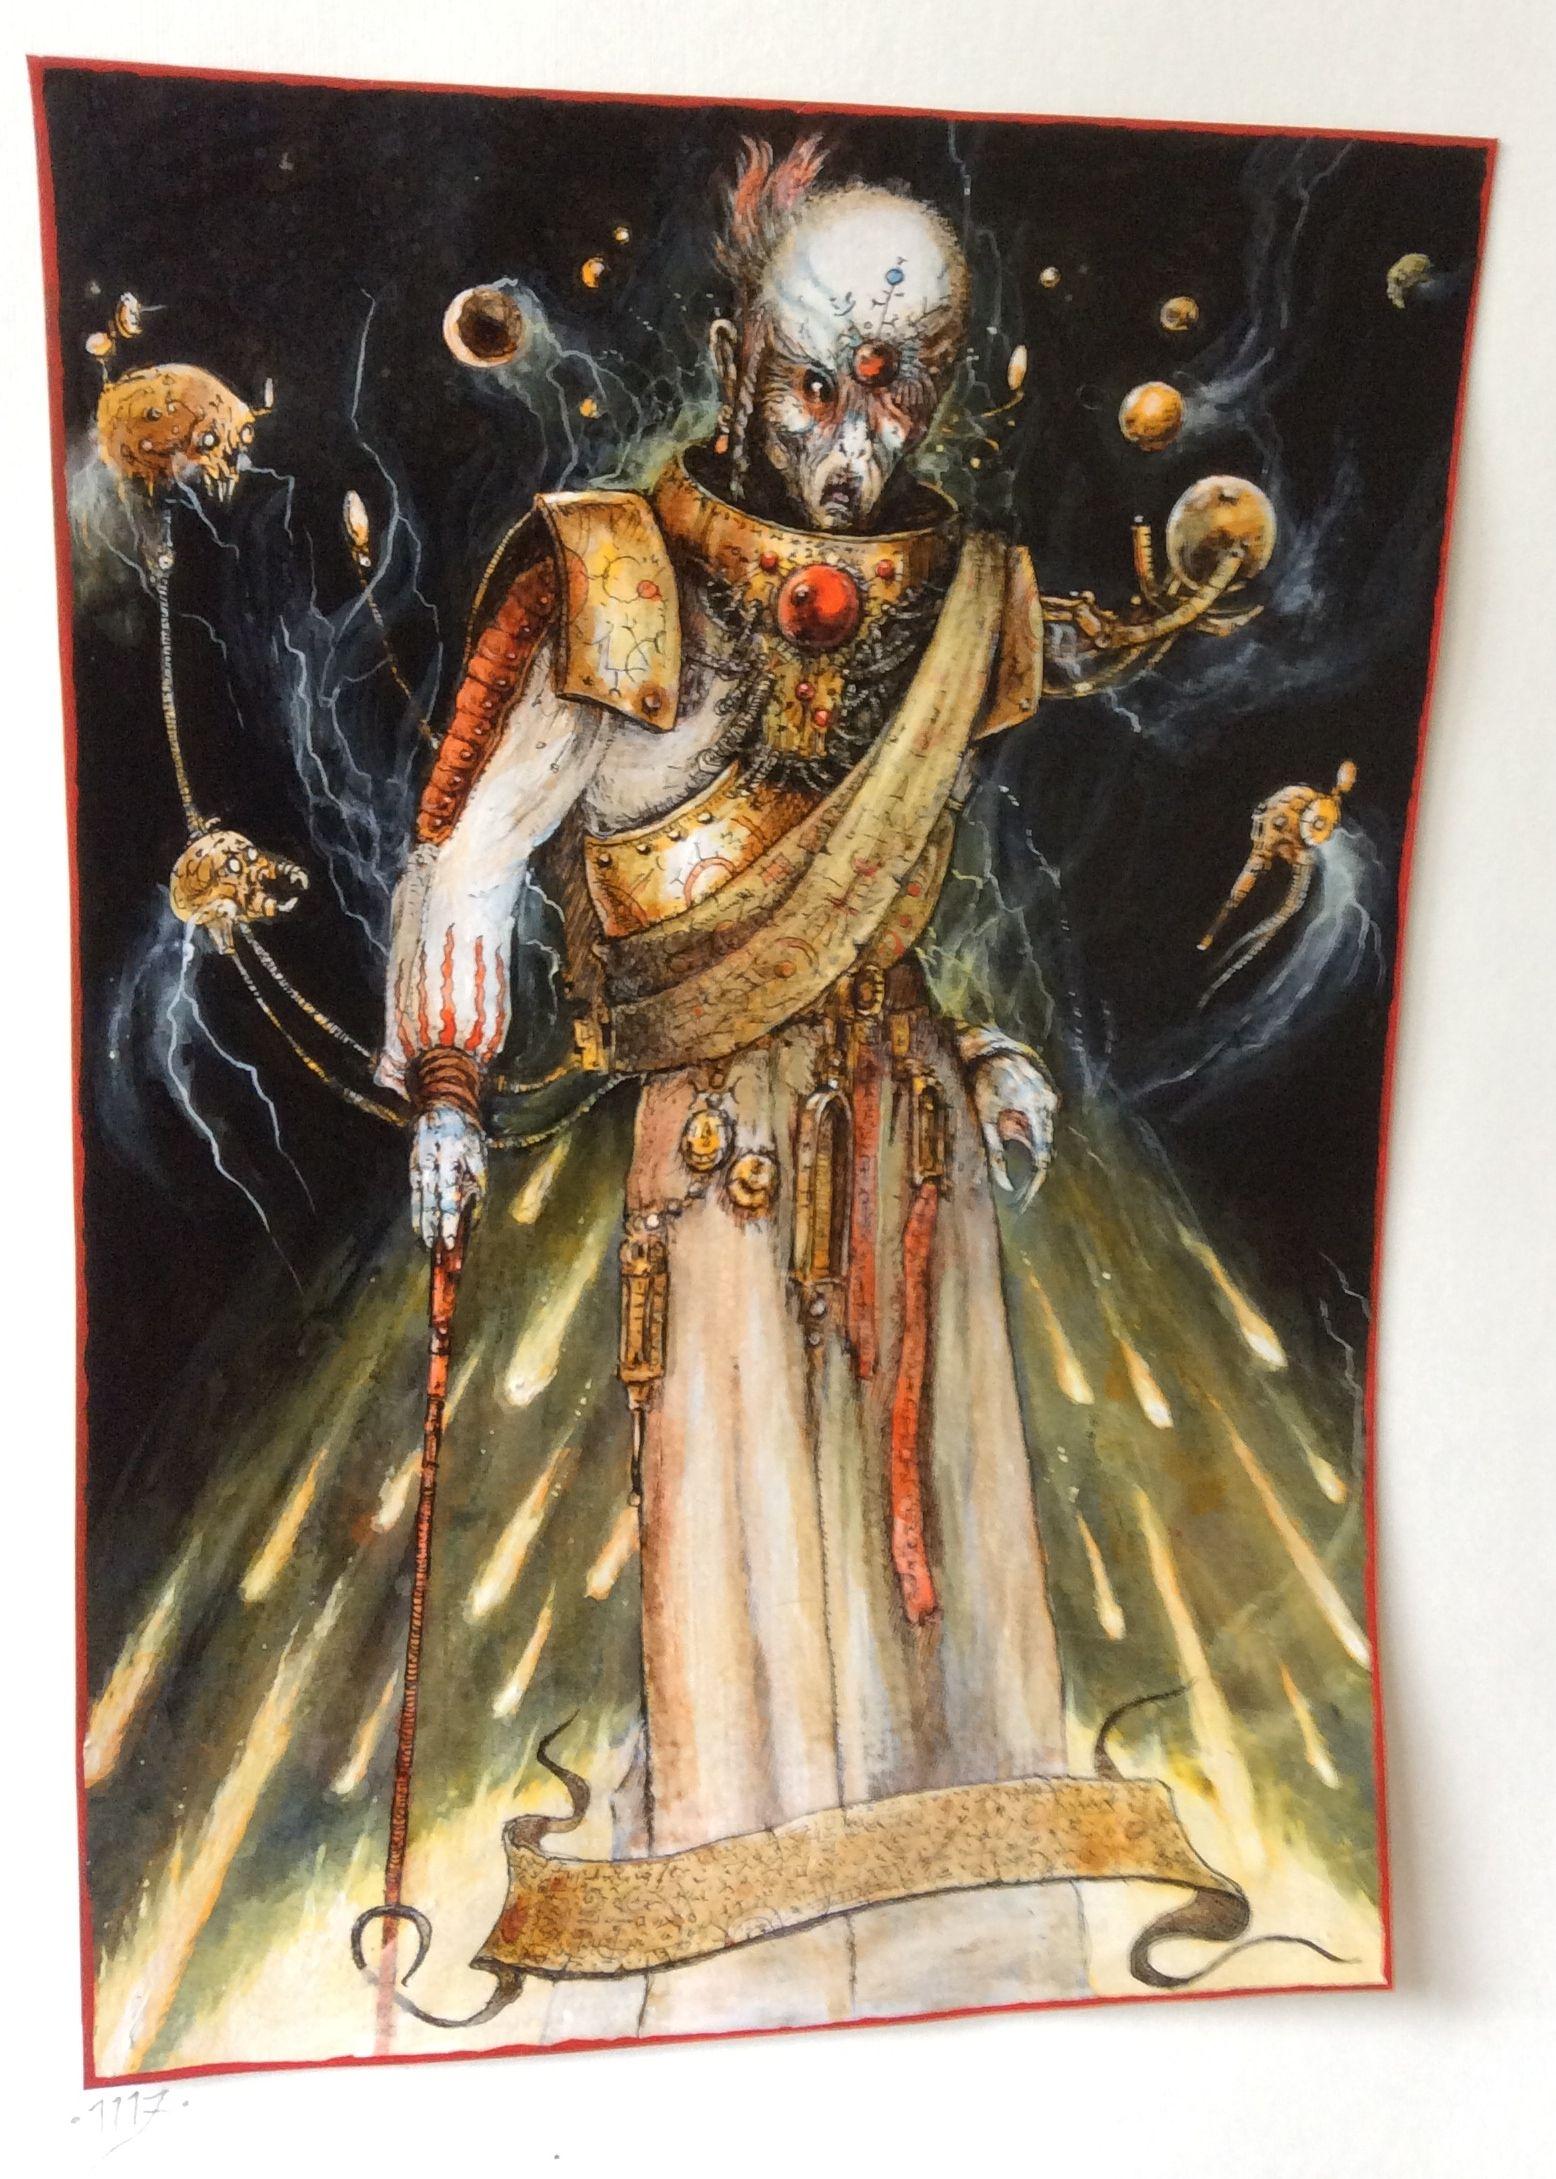 blanche navigator scifi fantasy art warhammer art warhammer 40k art art warhammer art warhammer 40k art